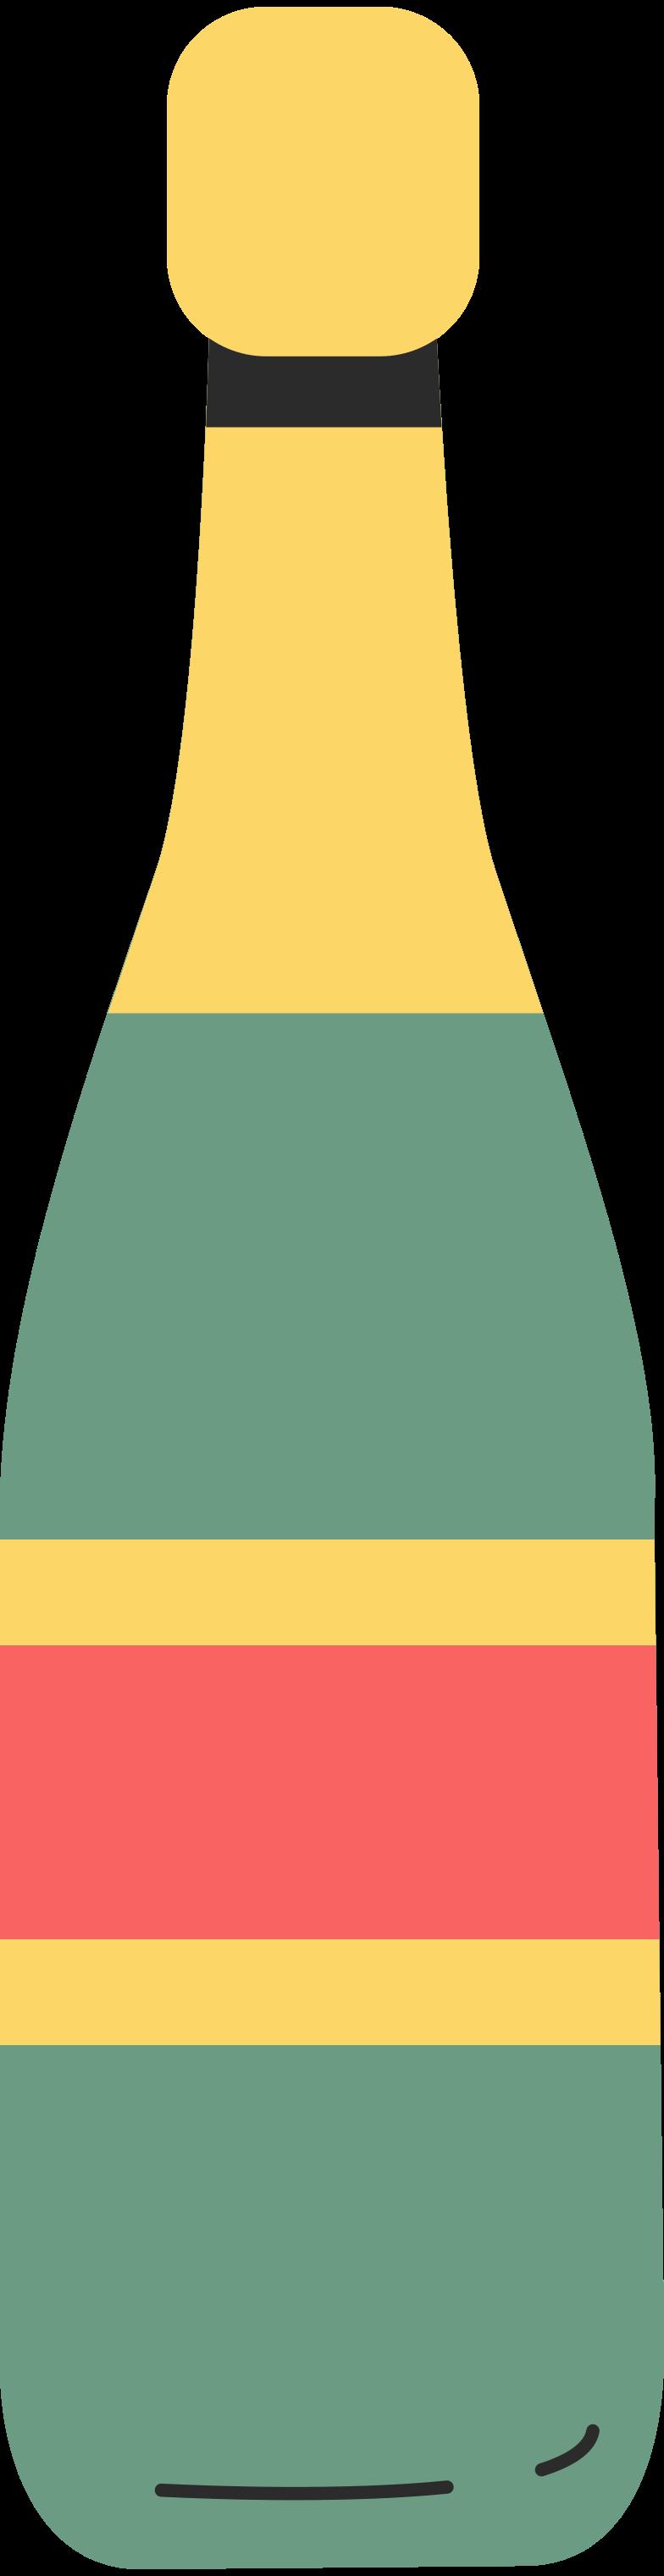 bottle of champagne Clipart illustration in PNG, SVG